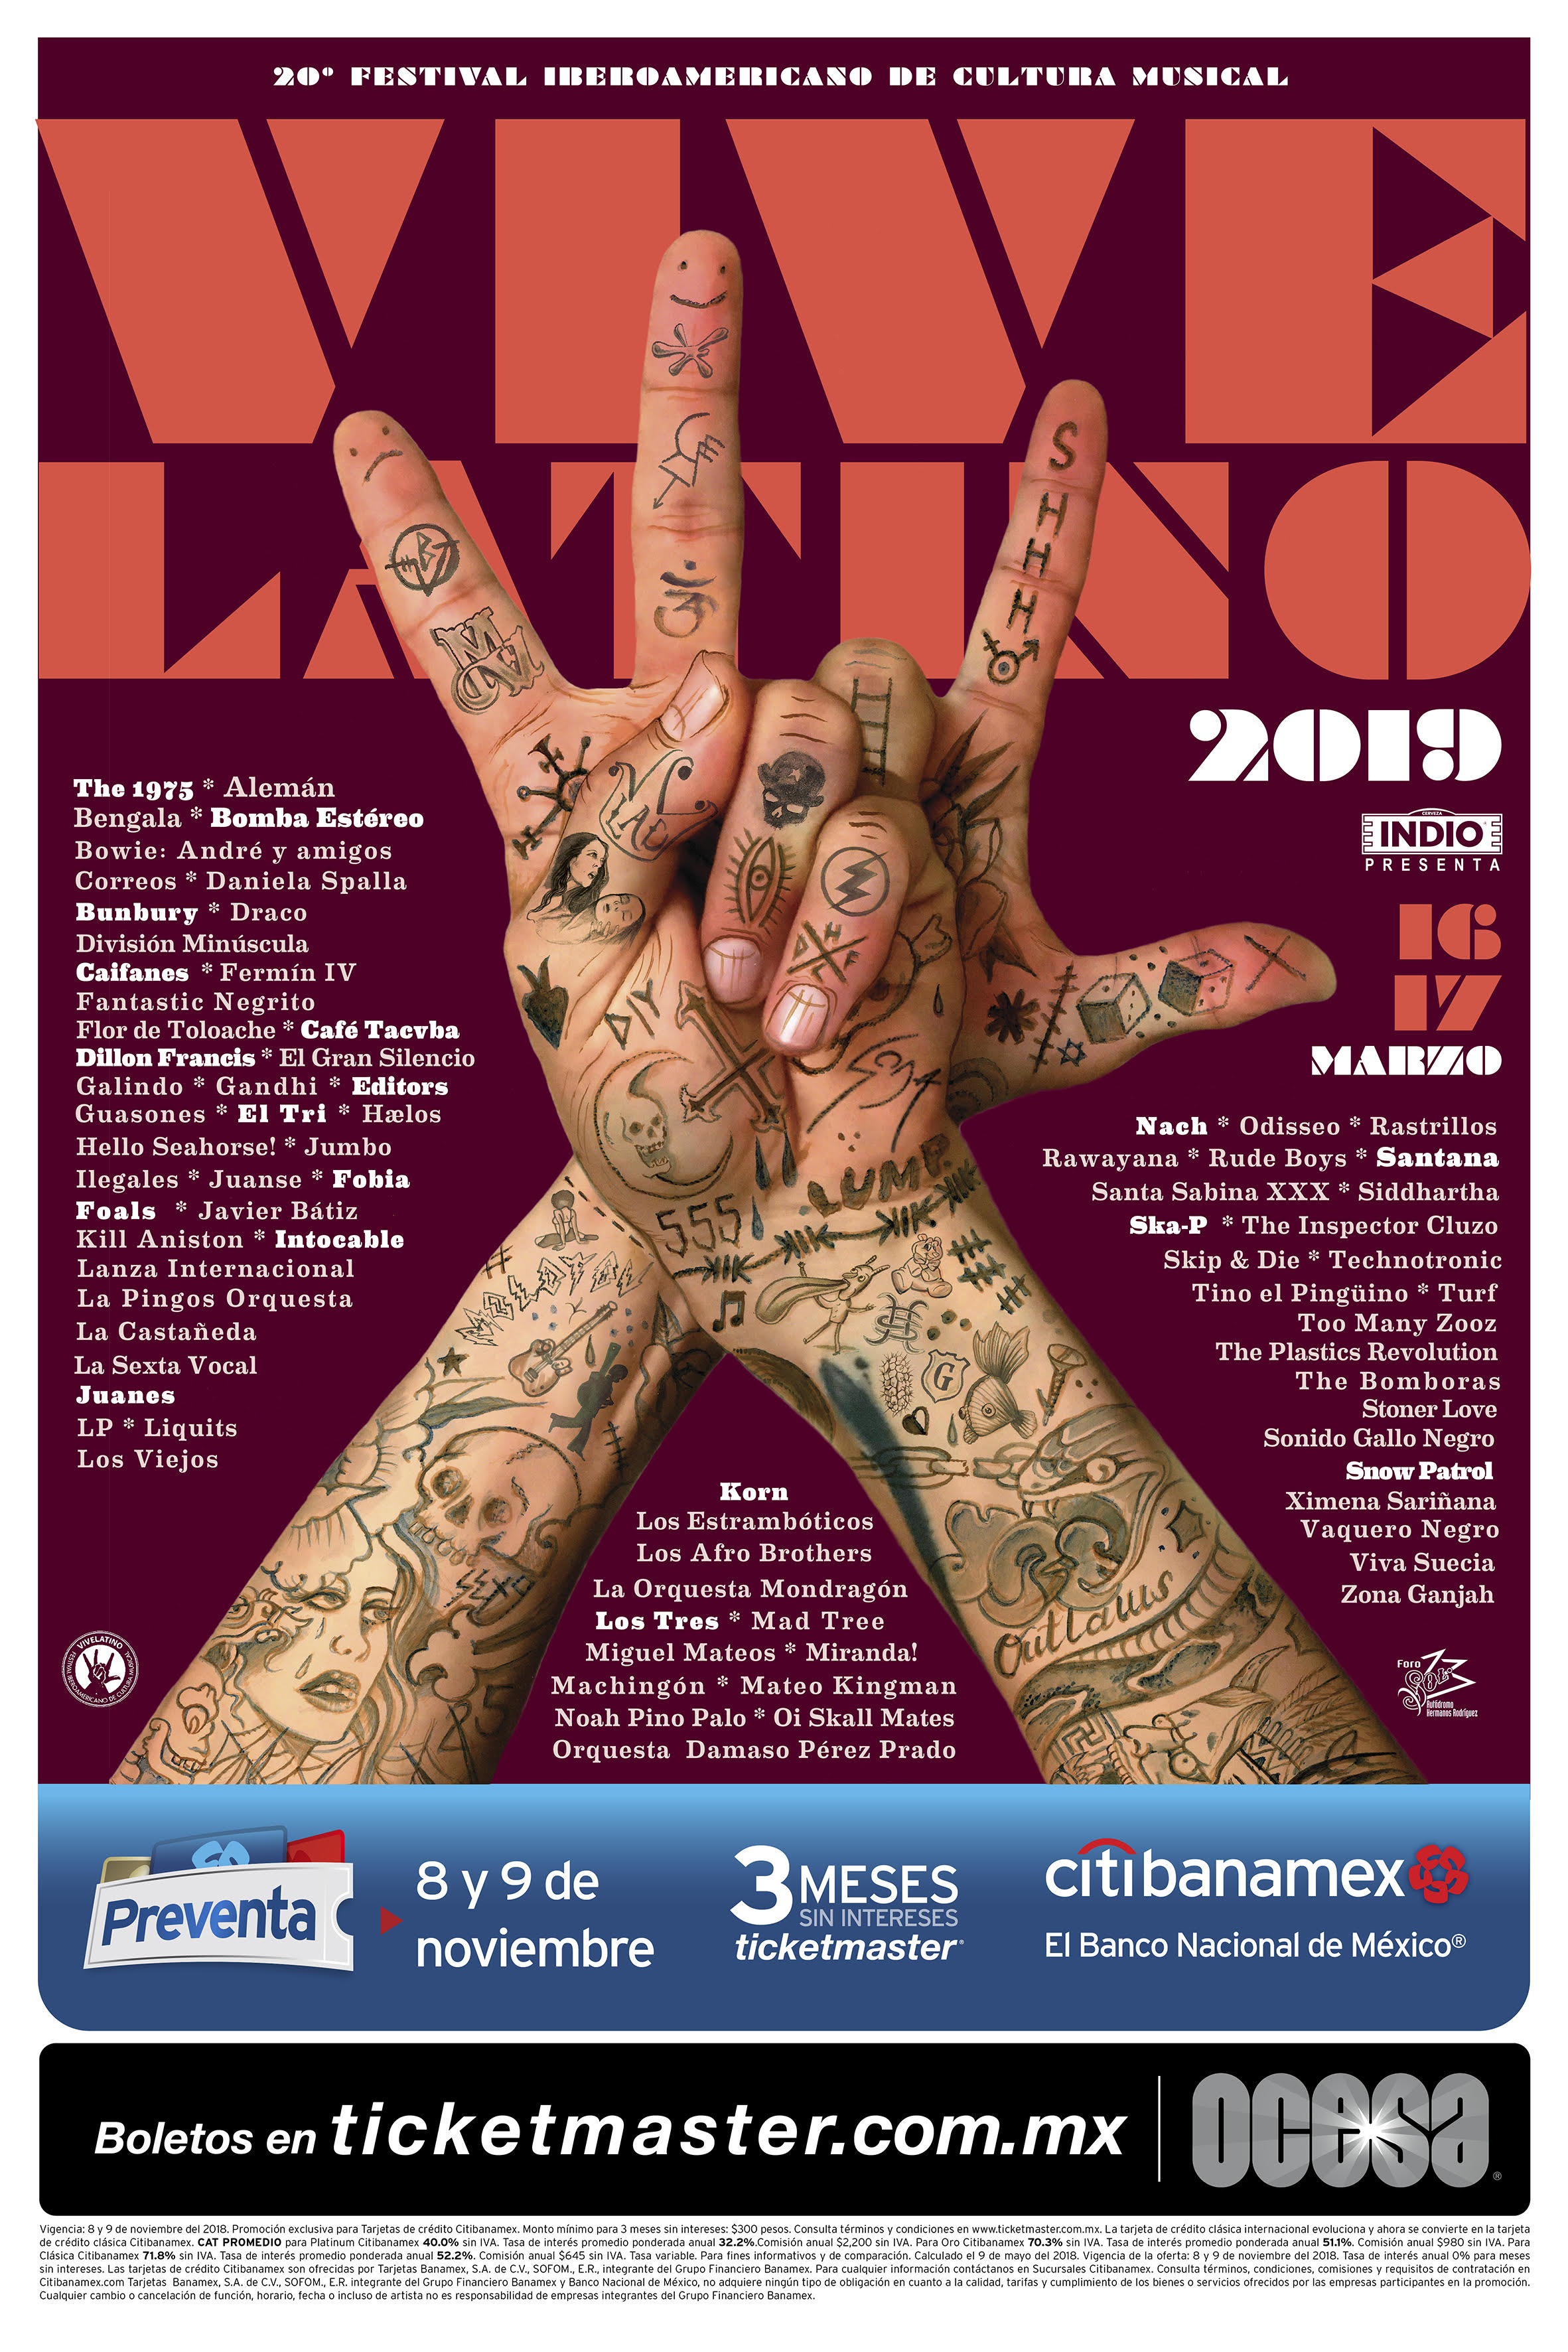 vivalatino2019